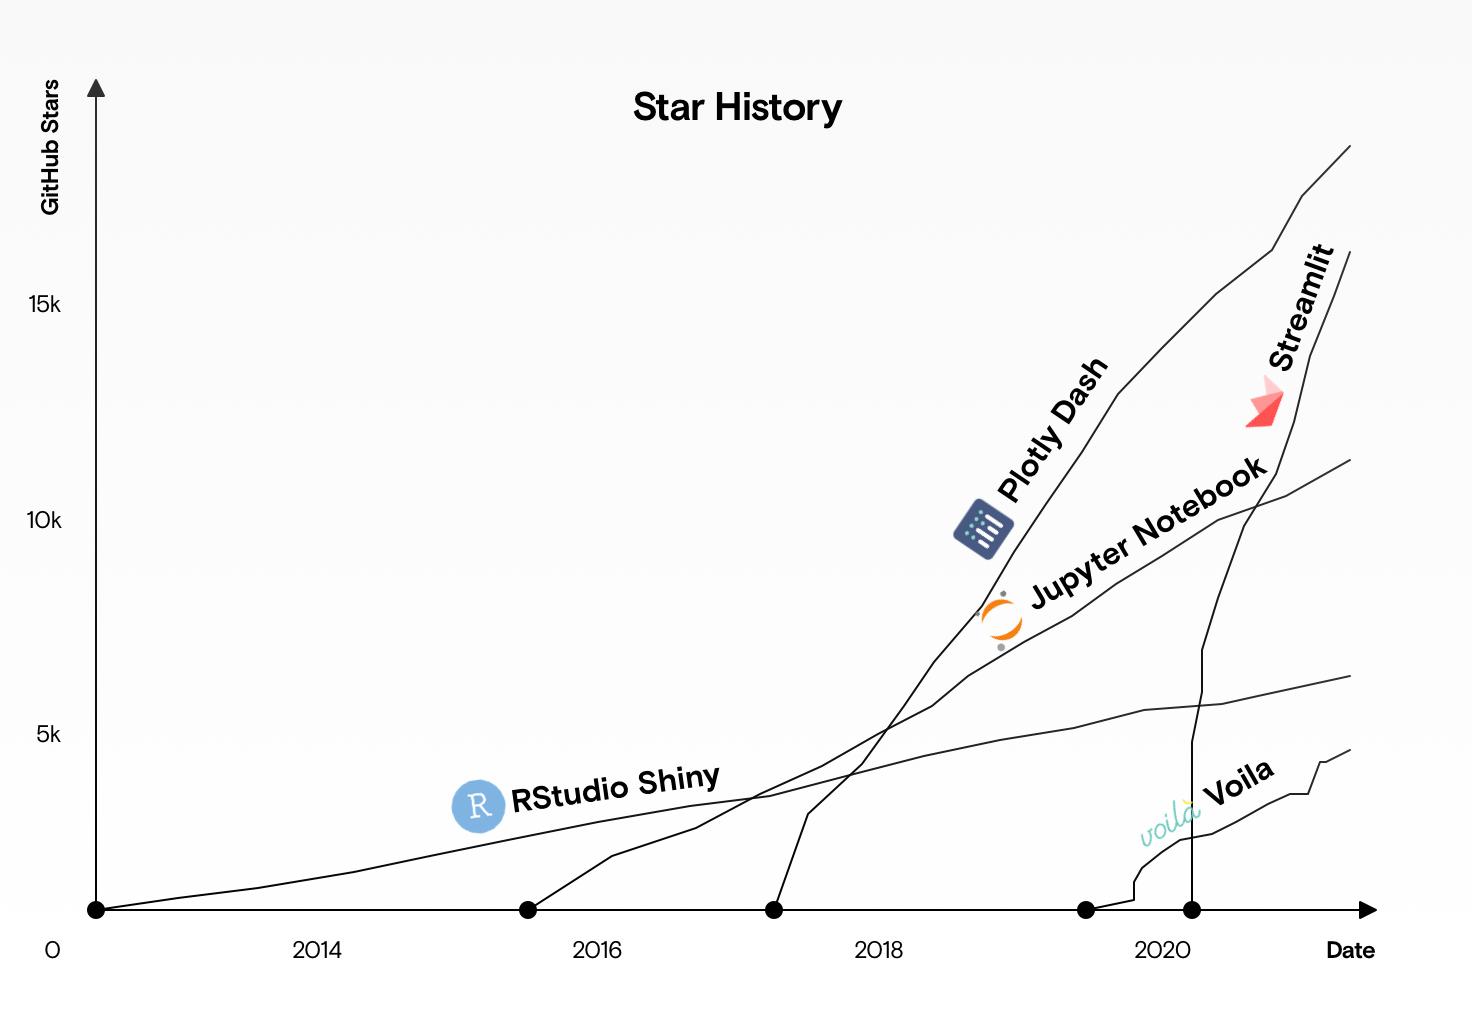 A graph showing the GitHub star history of Viola, Dash, Shiny, Streamlit, and Jupyter.